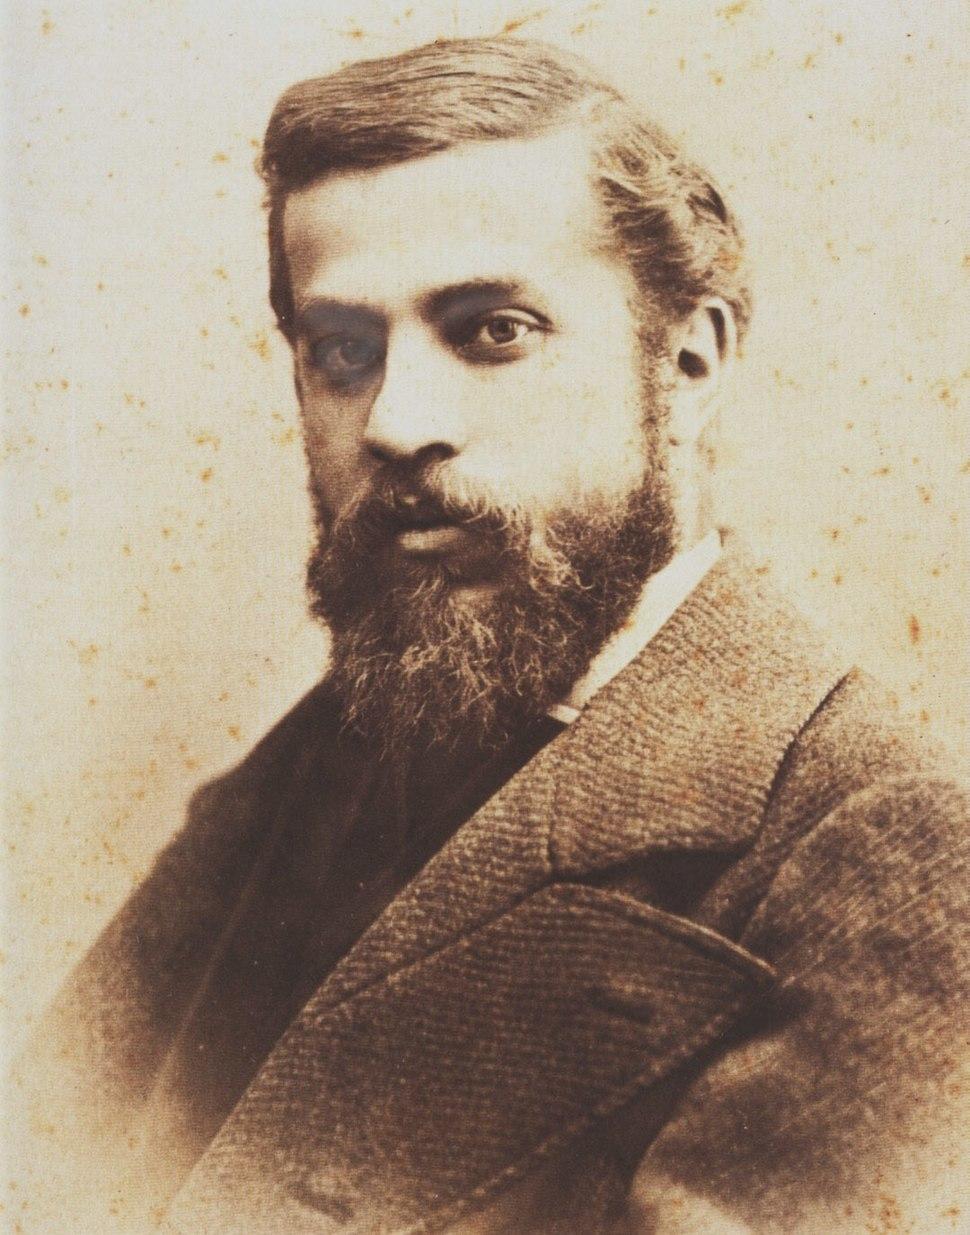 Gaudí (1878)